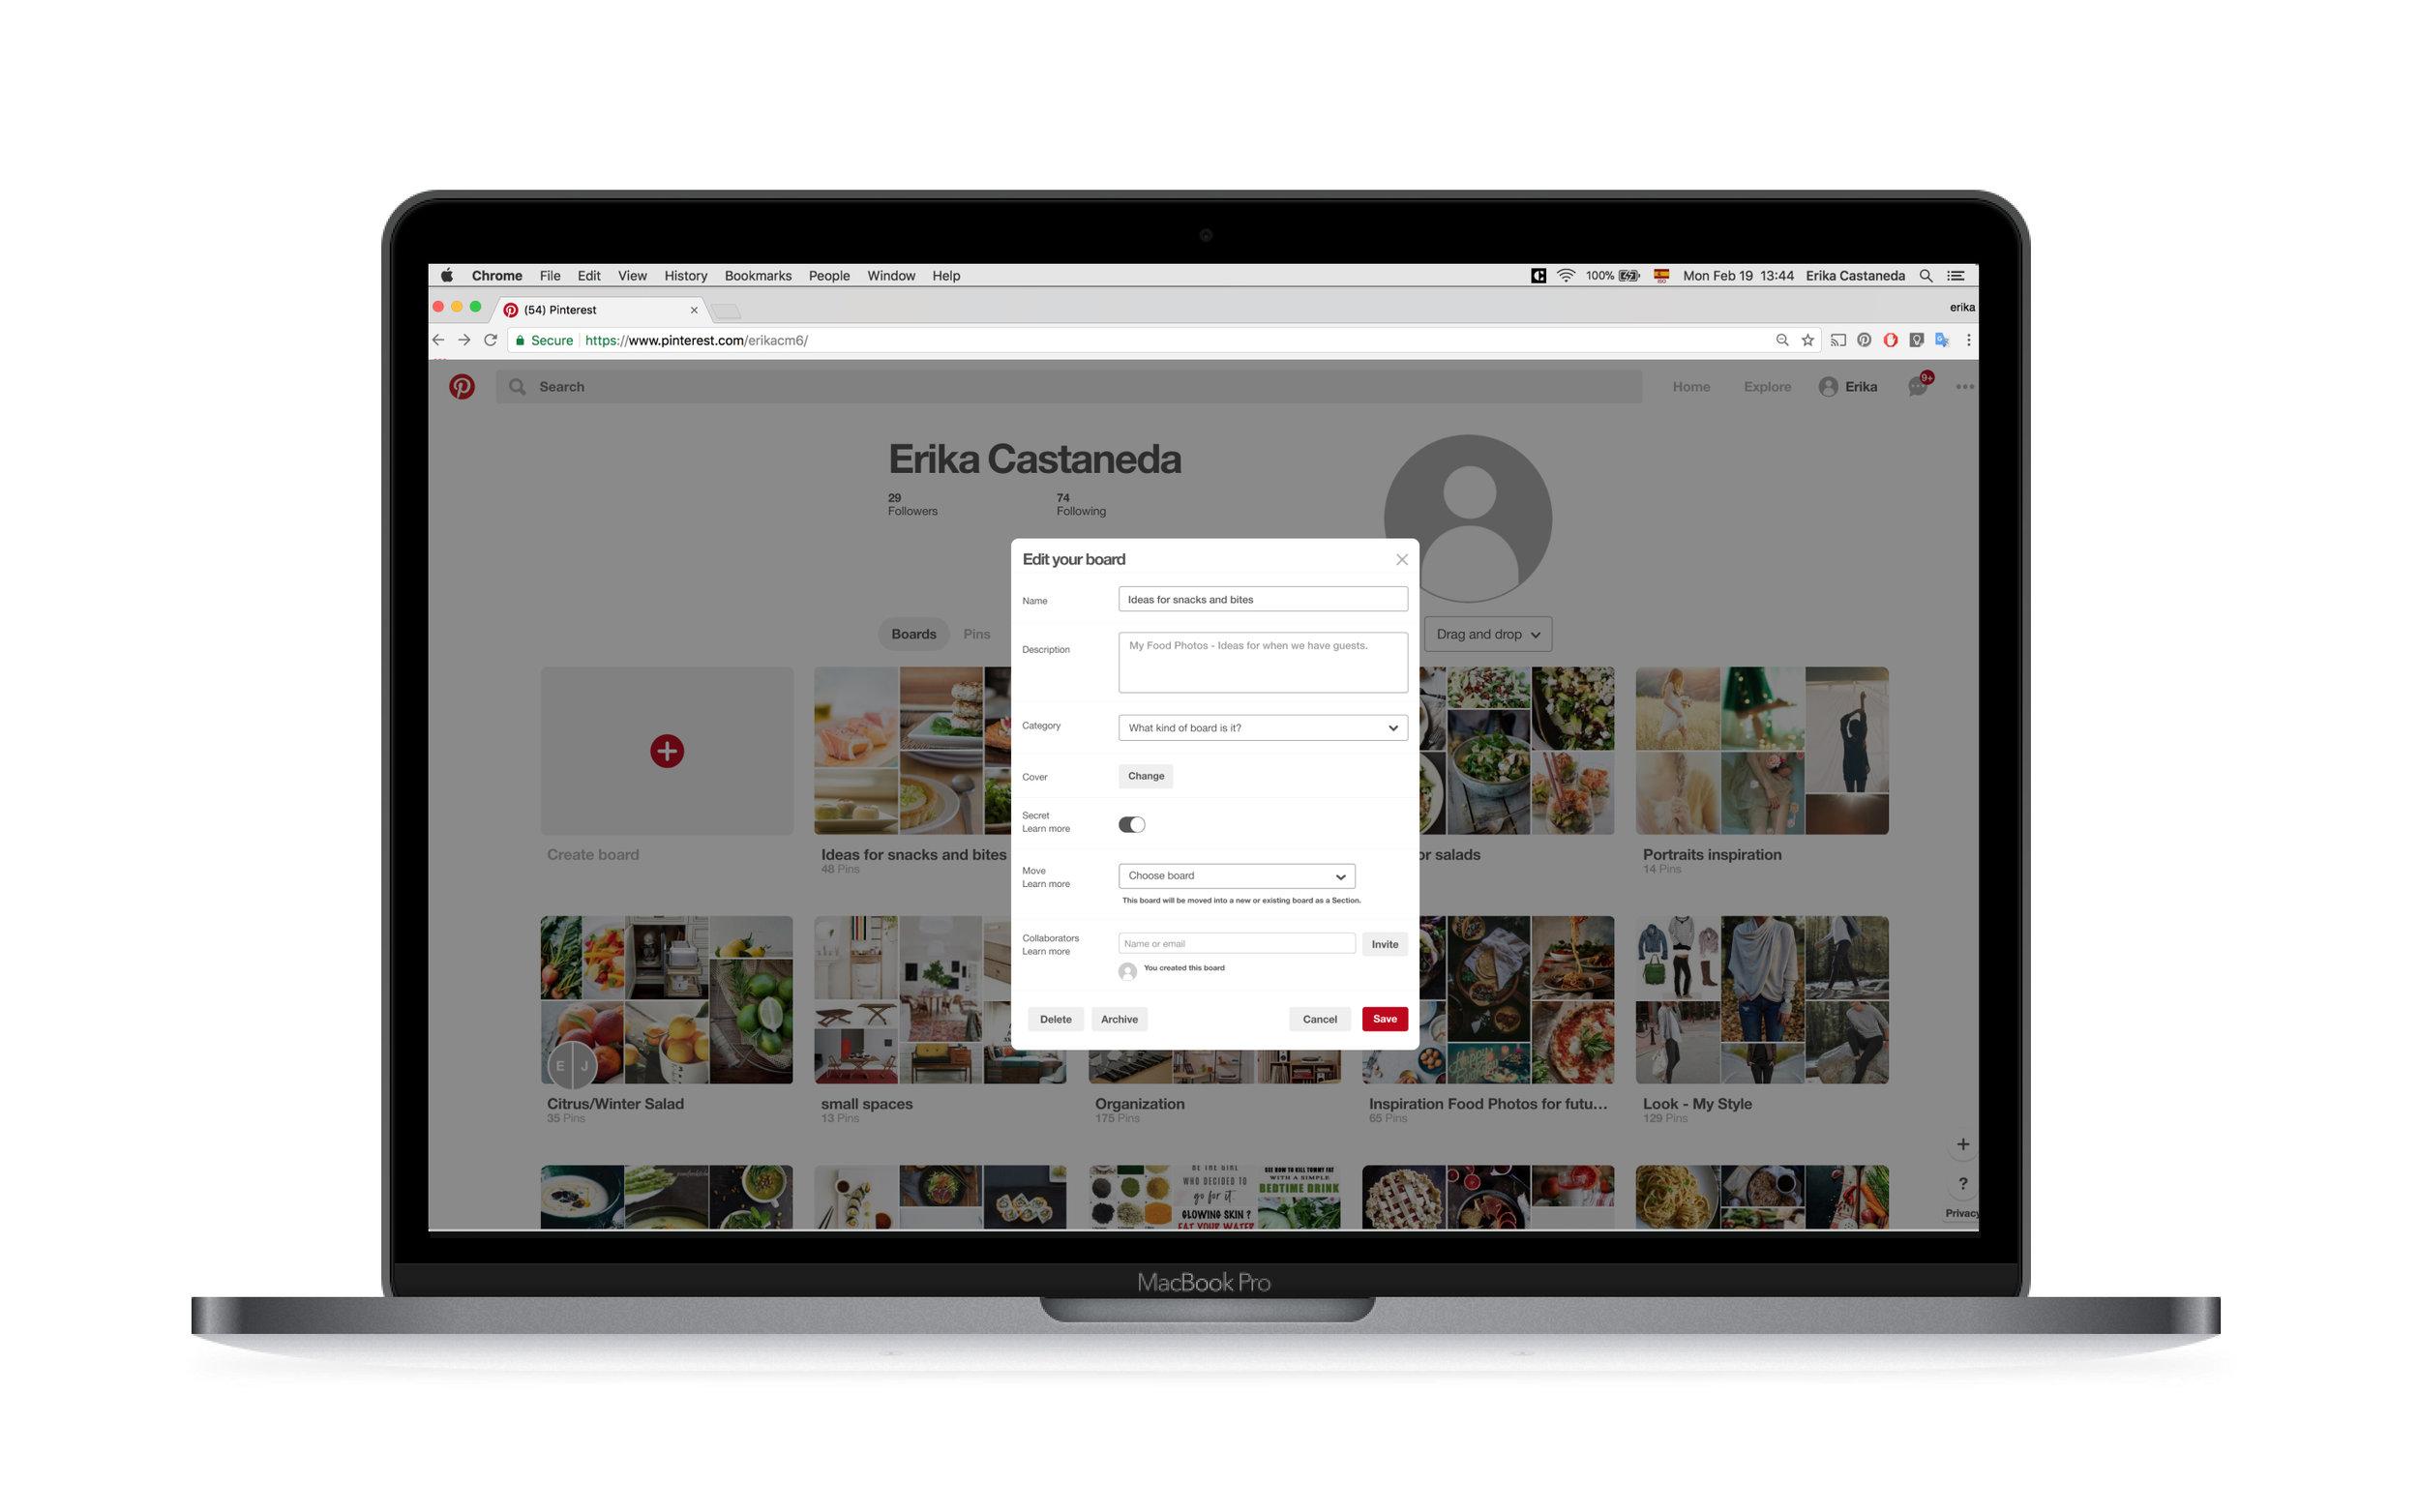 Pinterest - Making it easier to organize boards on Pinterest